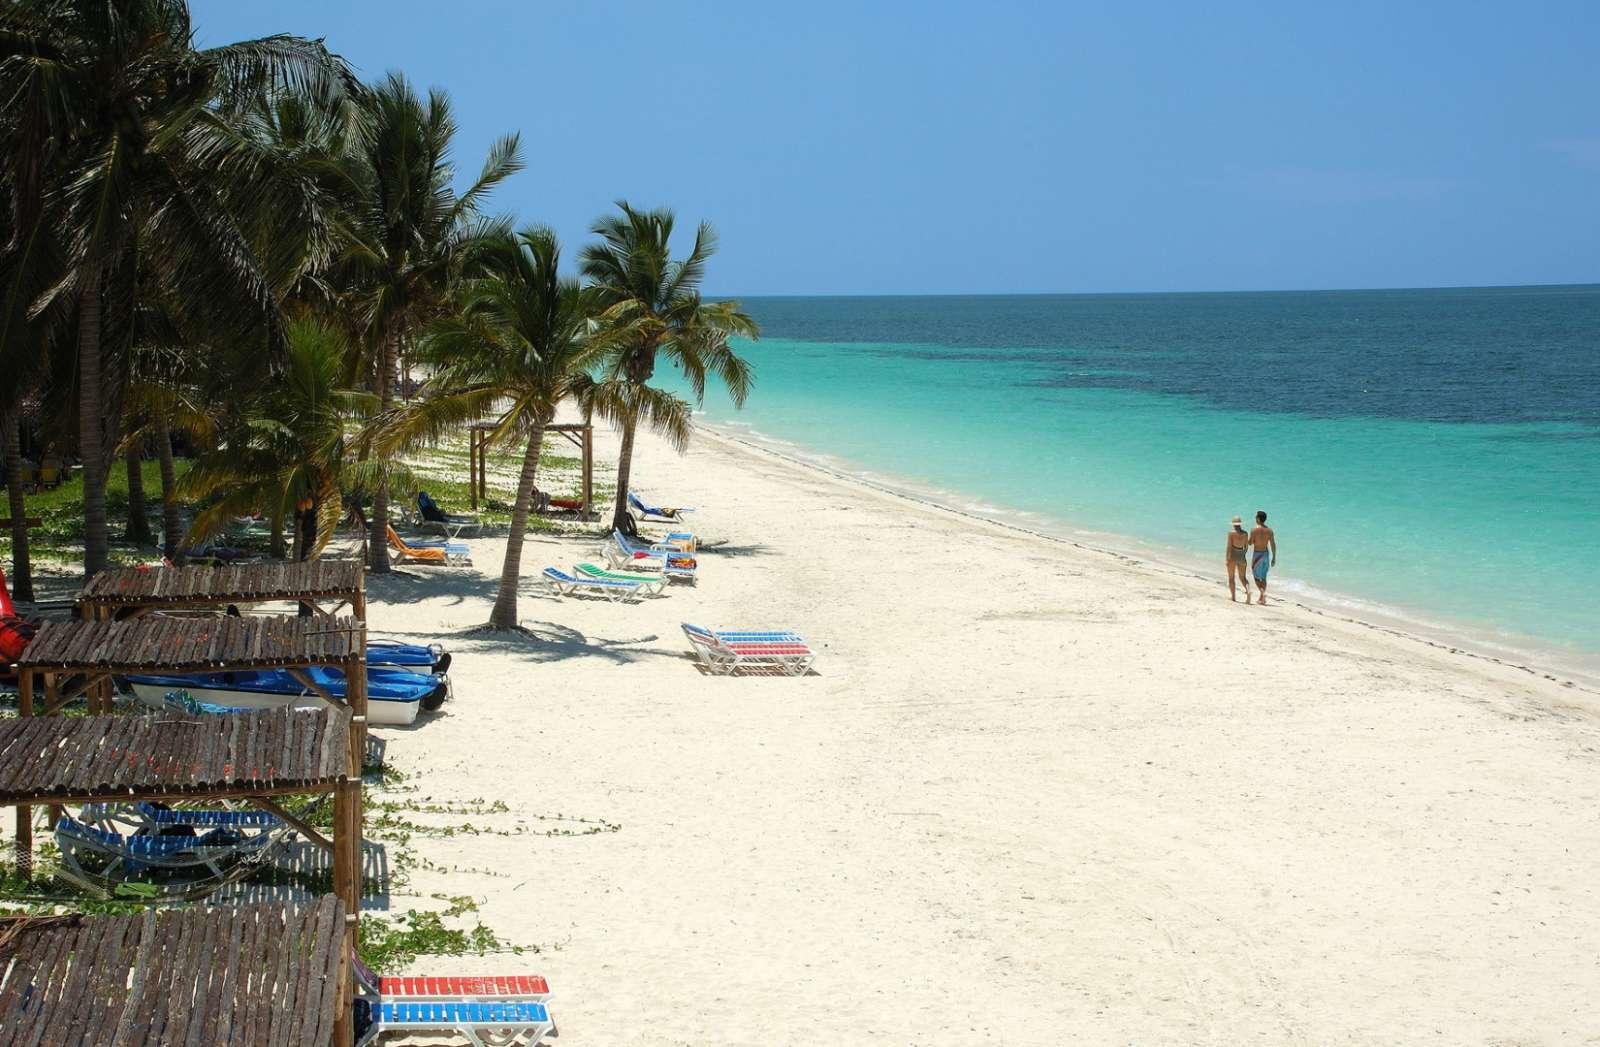 The beautiful beach on Cayo Levisa, Cuba